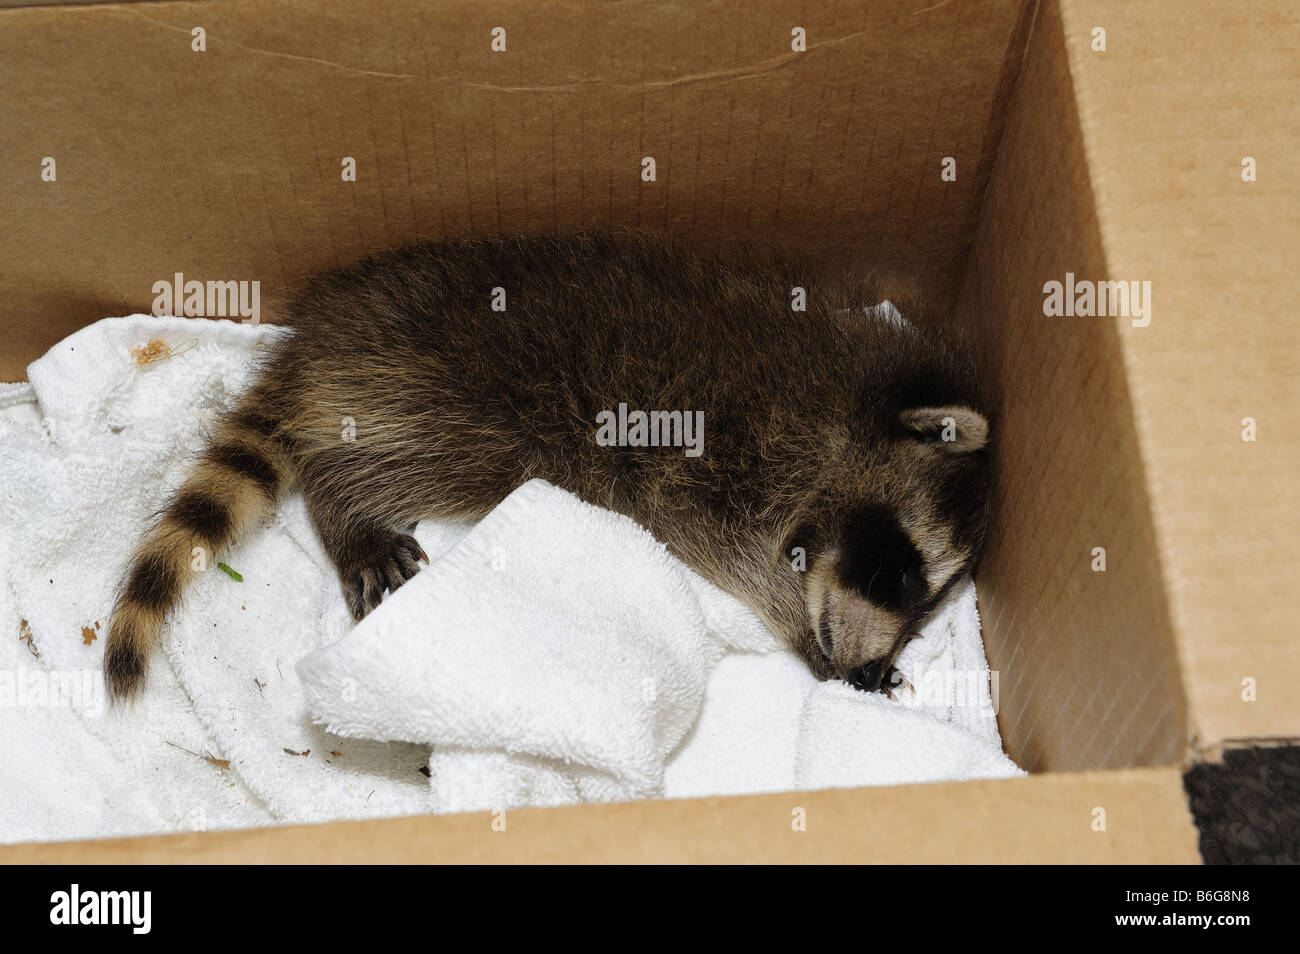 Salvato baby raccoon dormire in una scatola Immagini Stock